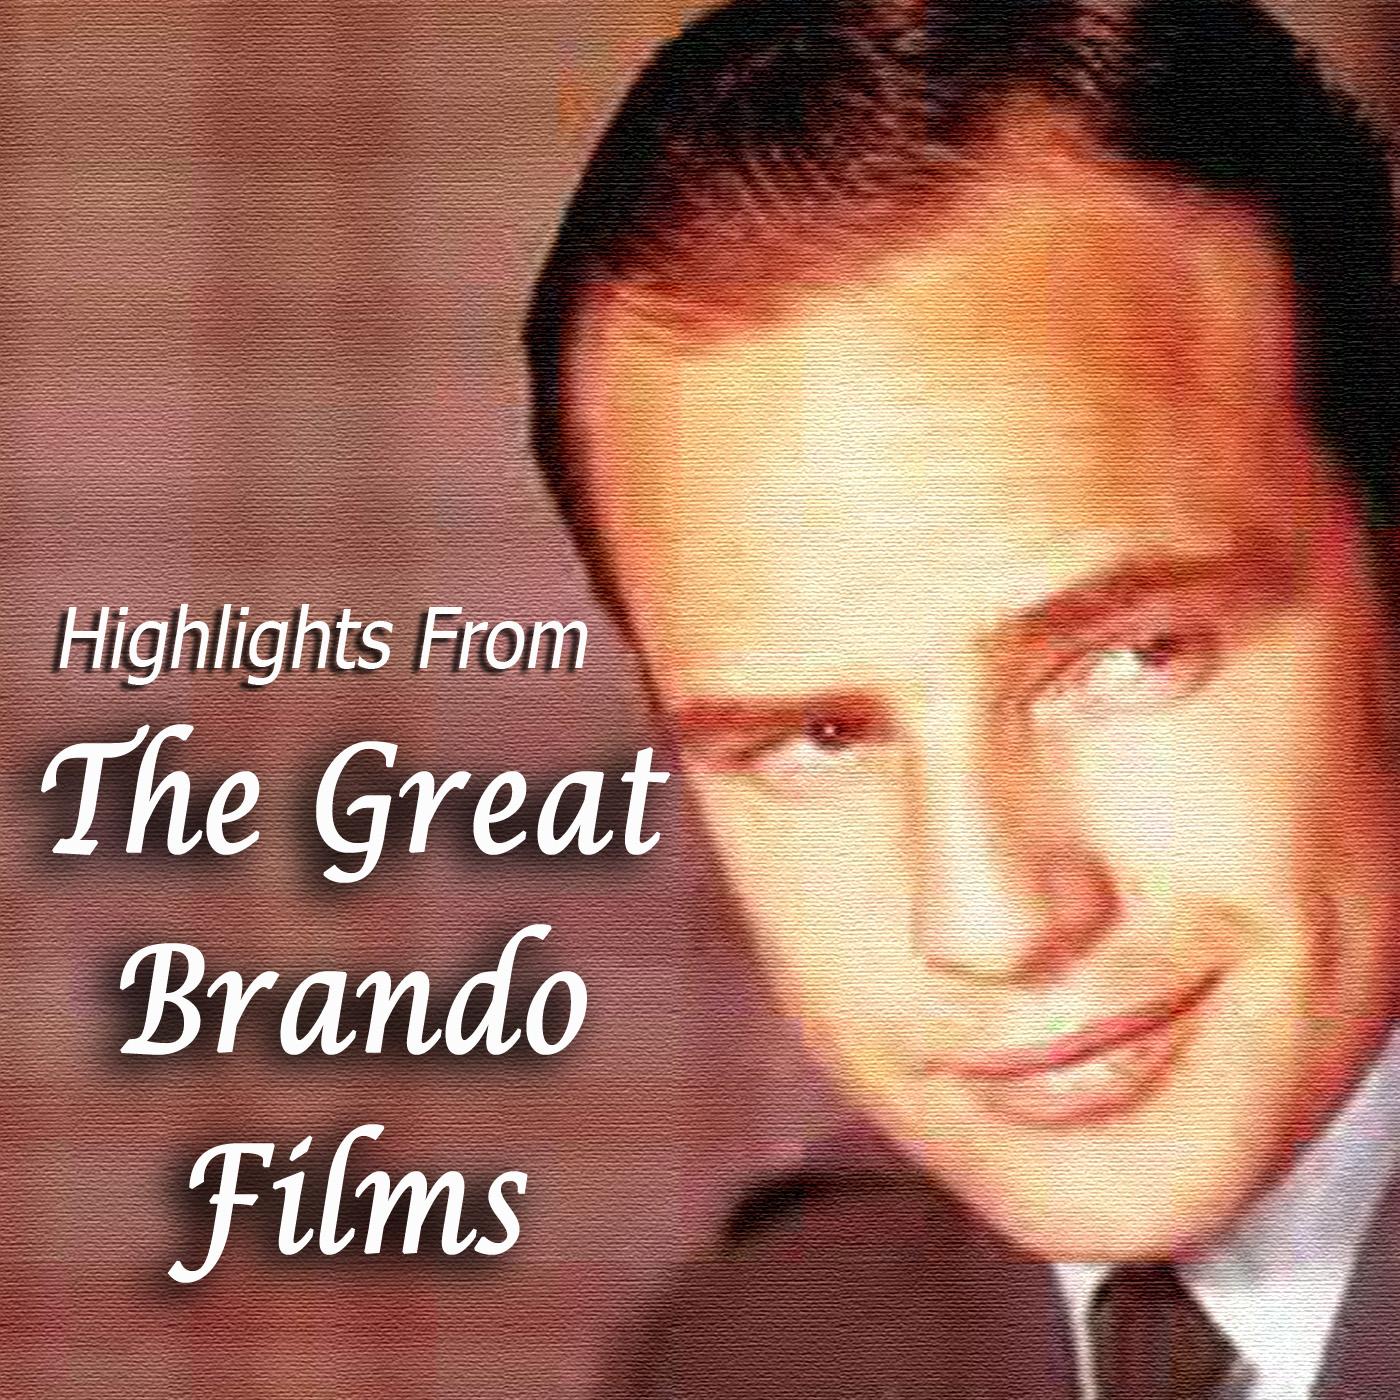 The Great Brando Films